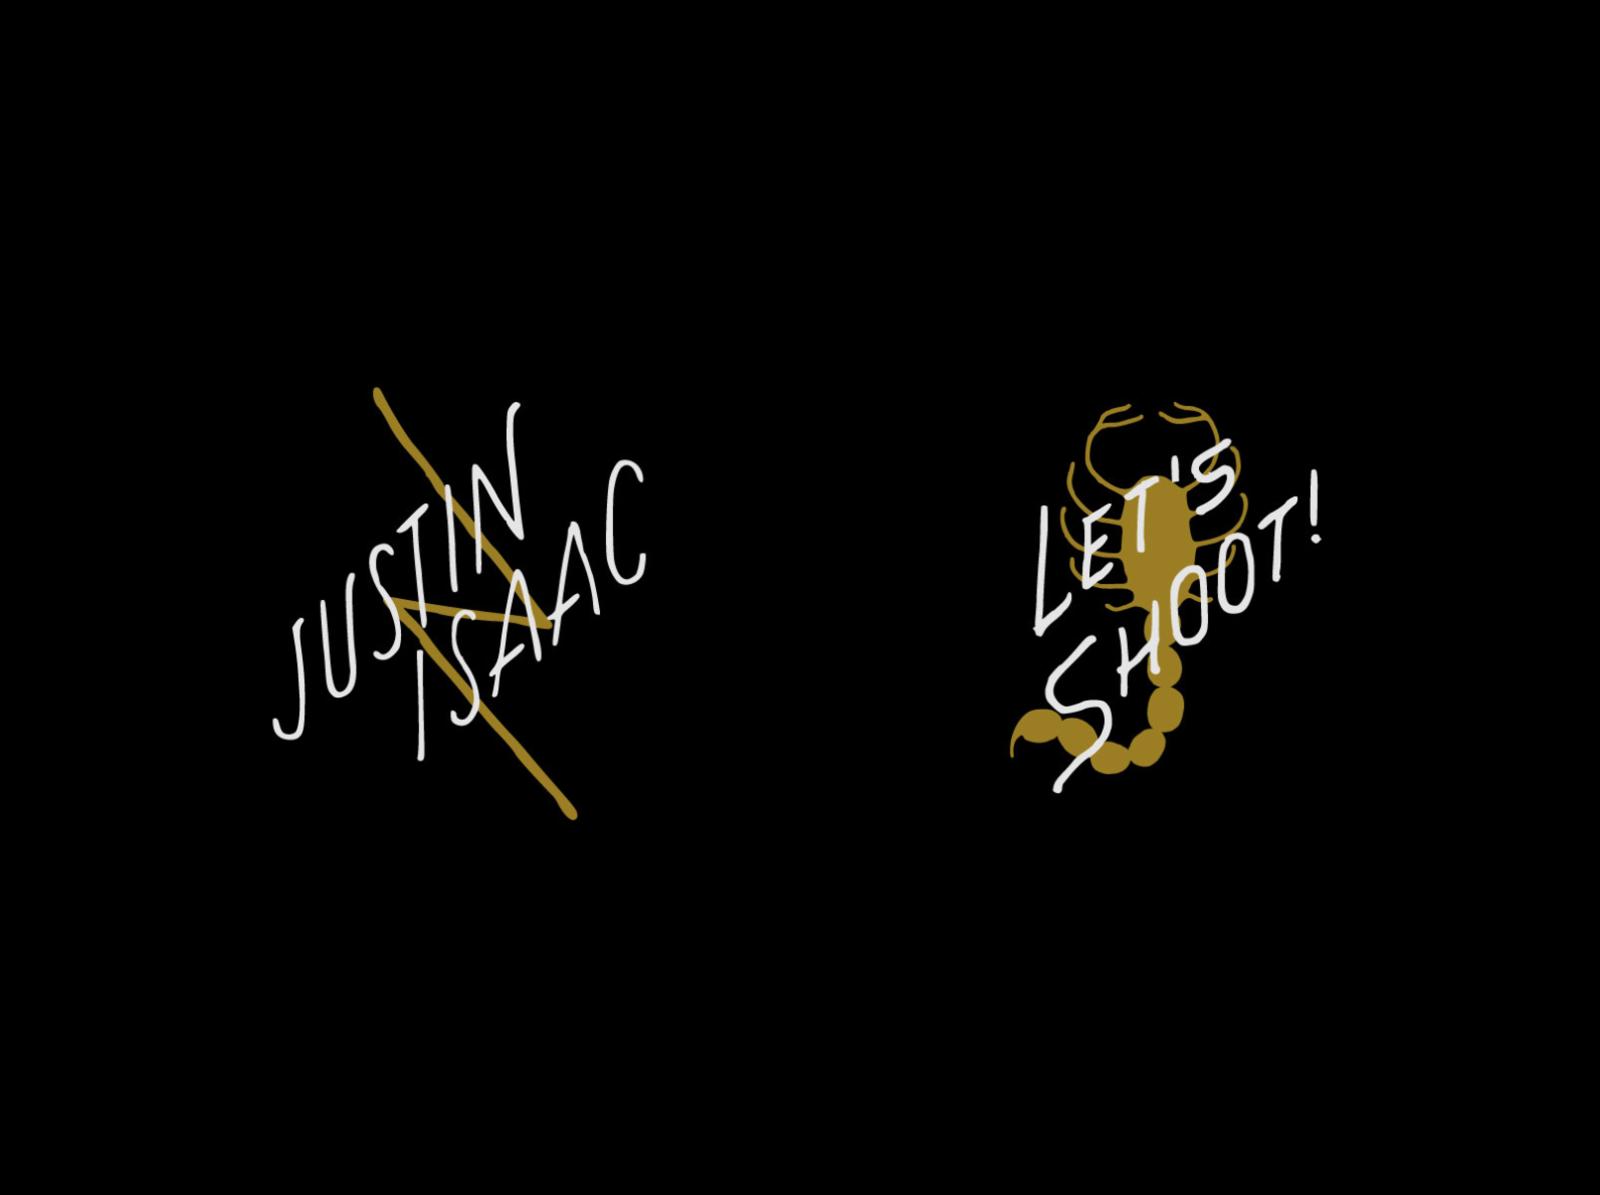 Justin Isaac Logos